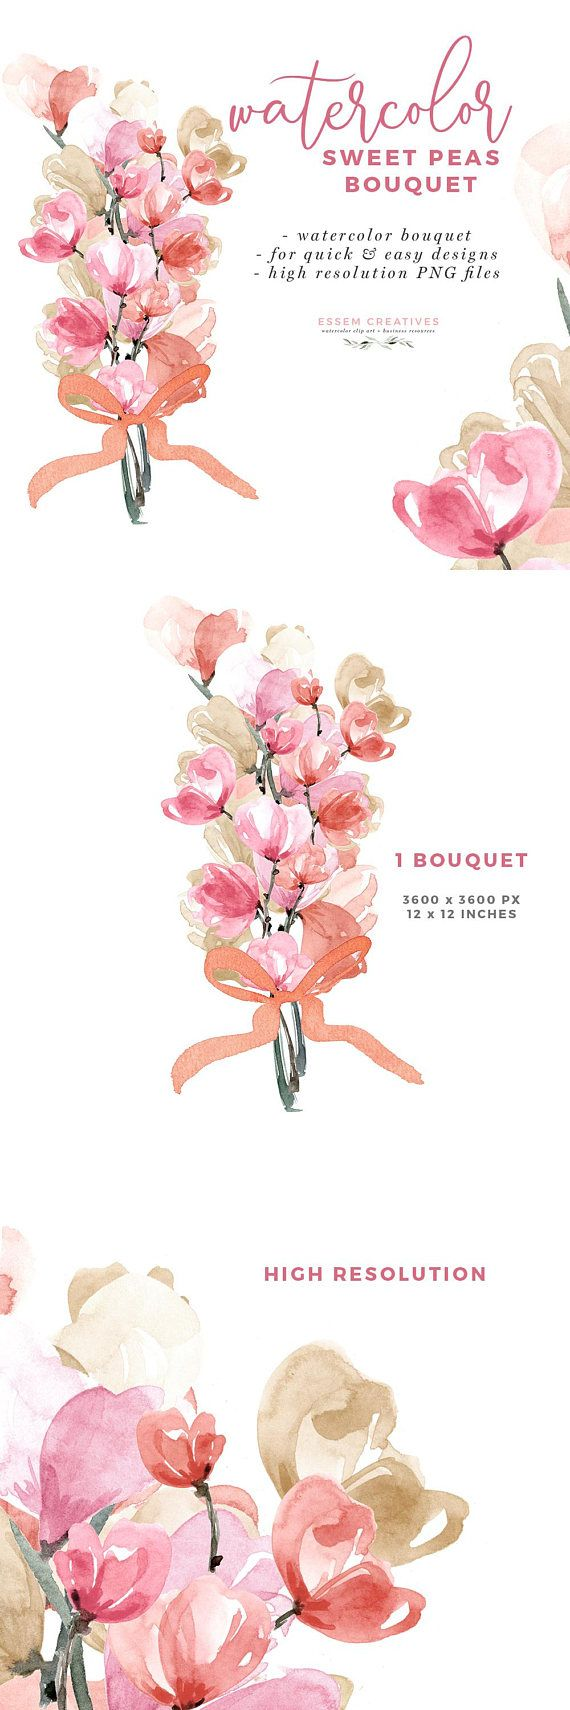 Watercolor Sweet Peas Bouquet Clipart, Wedding Invite Clipart ...